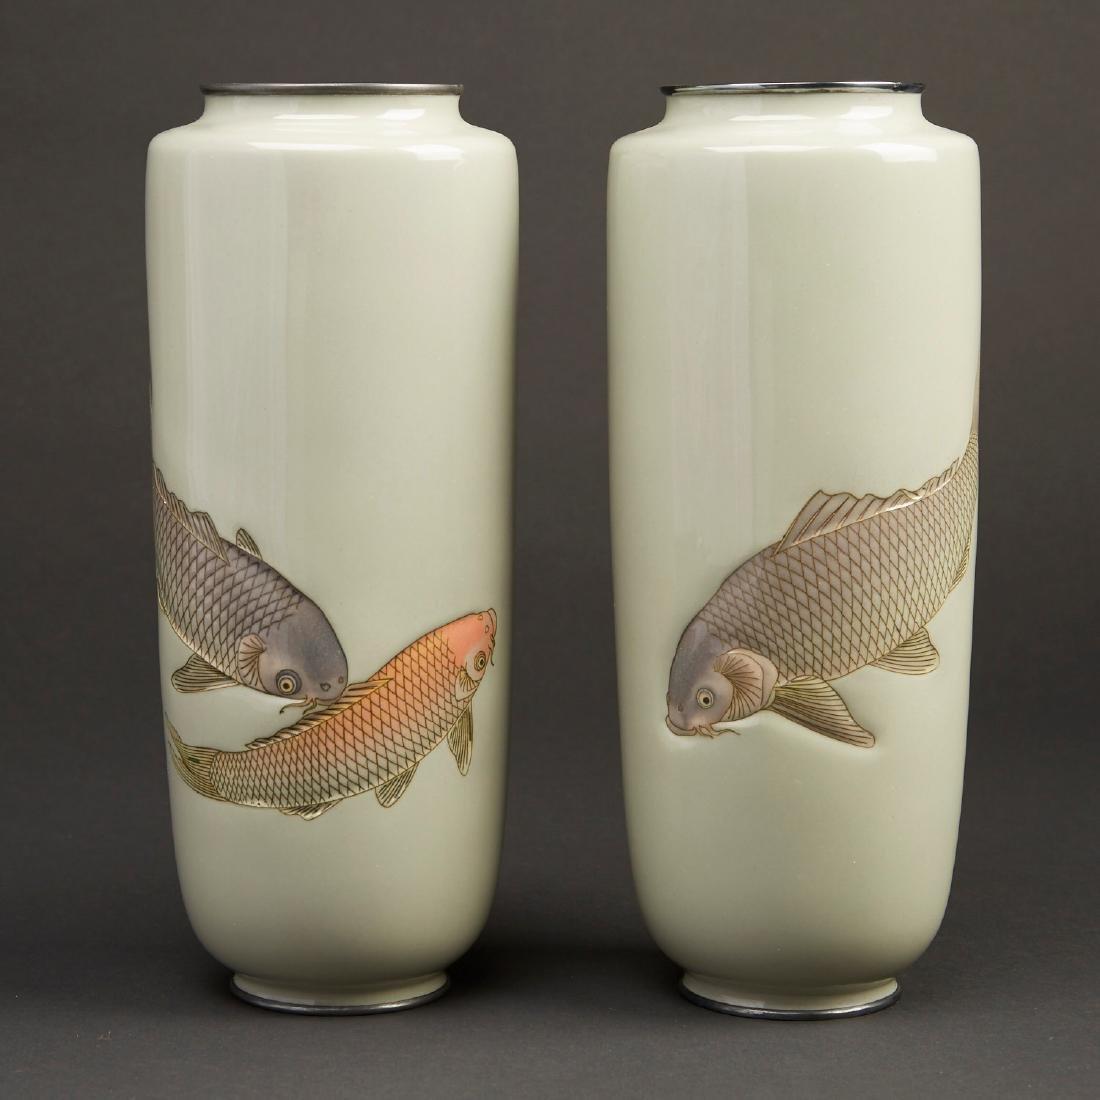 Hattori Tadasaburo Japanese Cloisonne Carp Vases